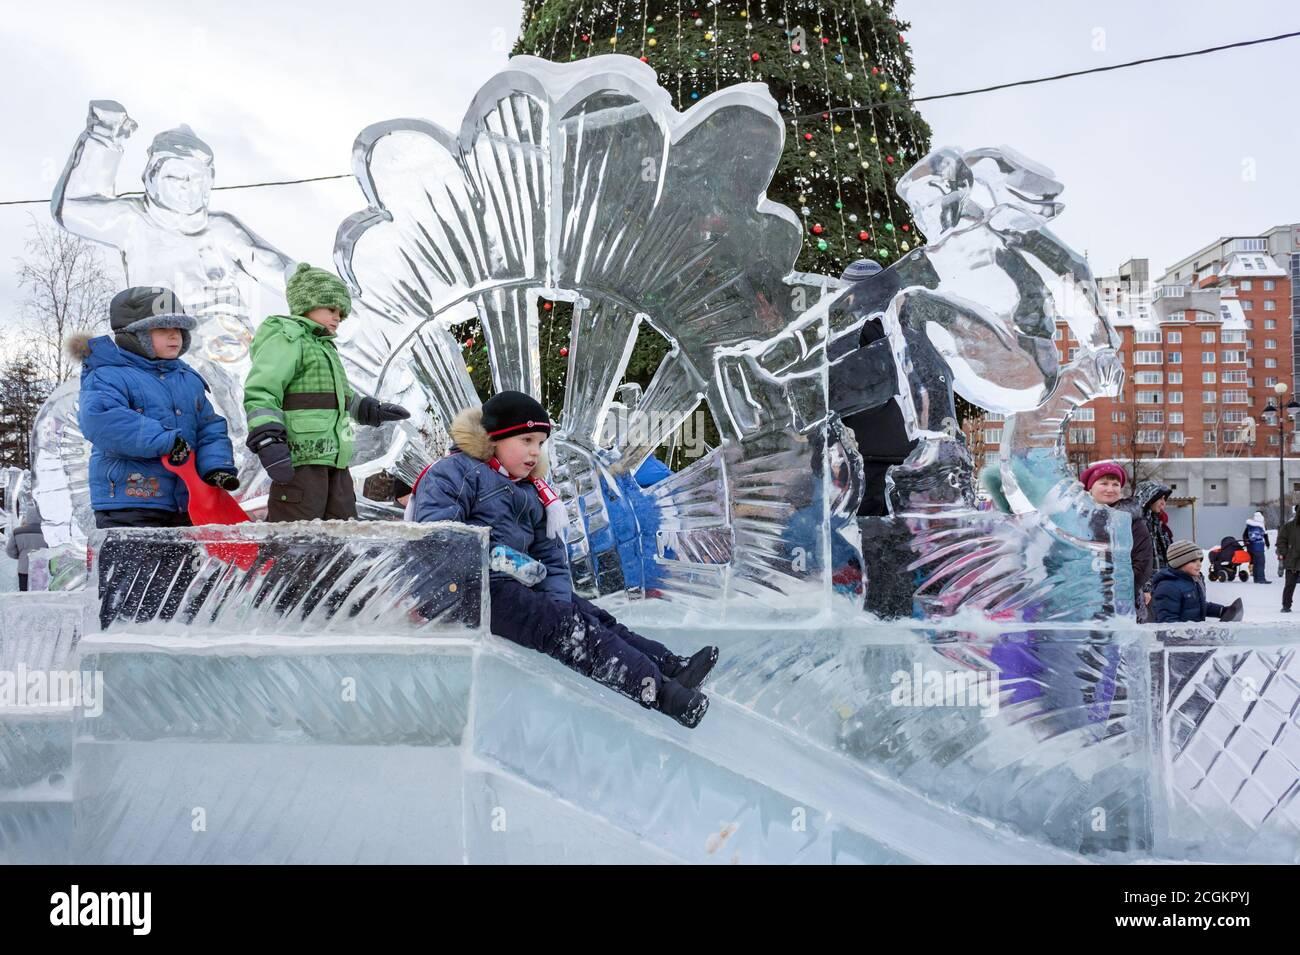 Children ride with an ice slide on the background Christmas tree in the center Krasnoyarsk city during the winter New Year holidays. Krasnoyarsk Terri Stock Photo